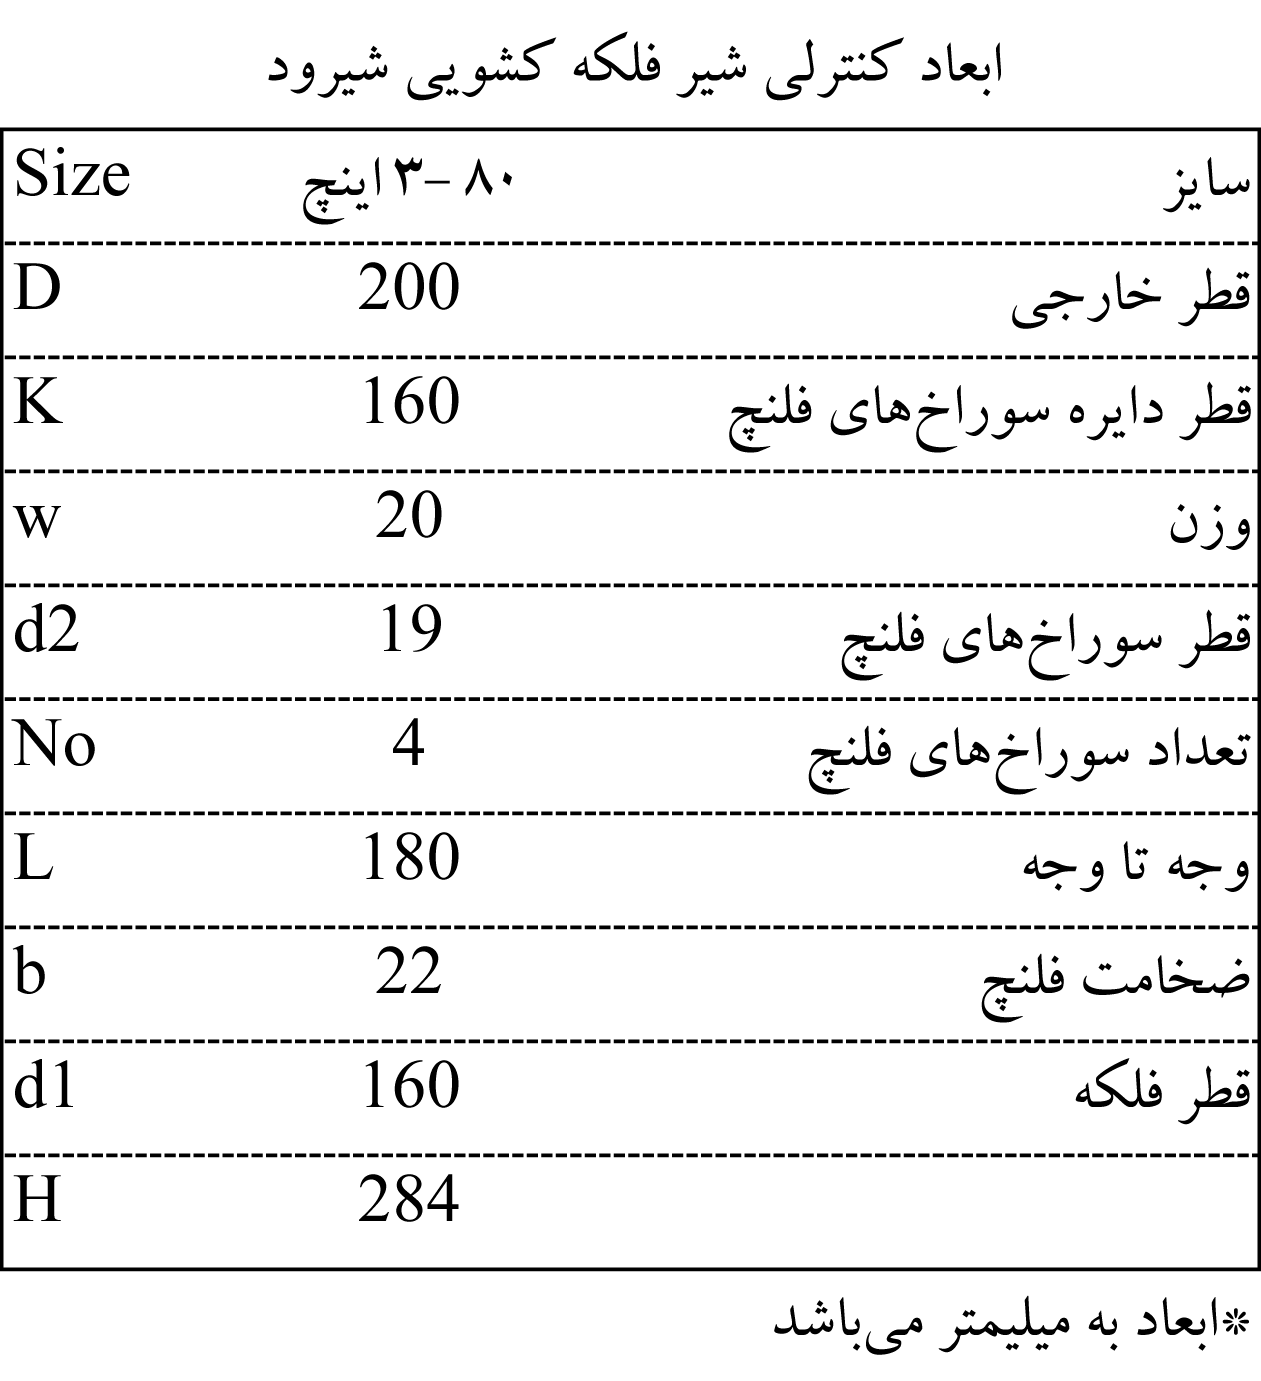 shirood 80 mm 10 bar